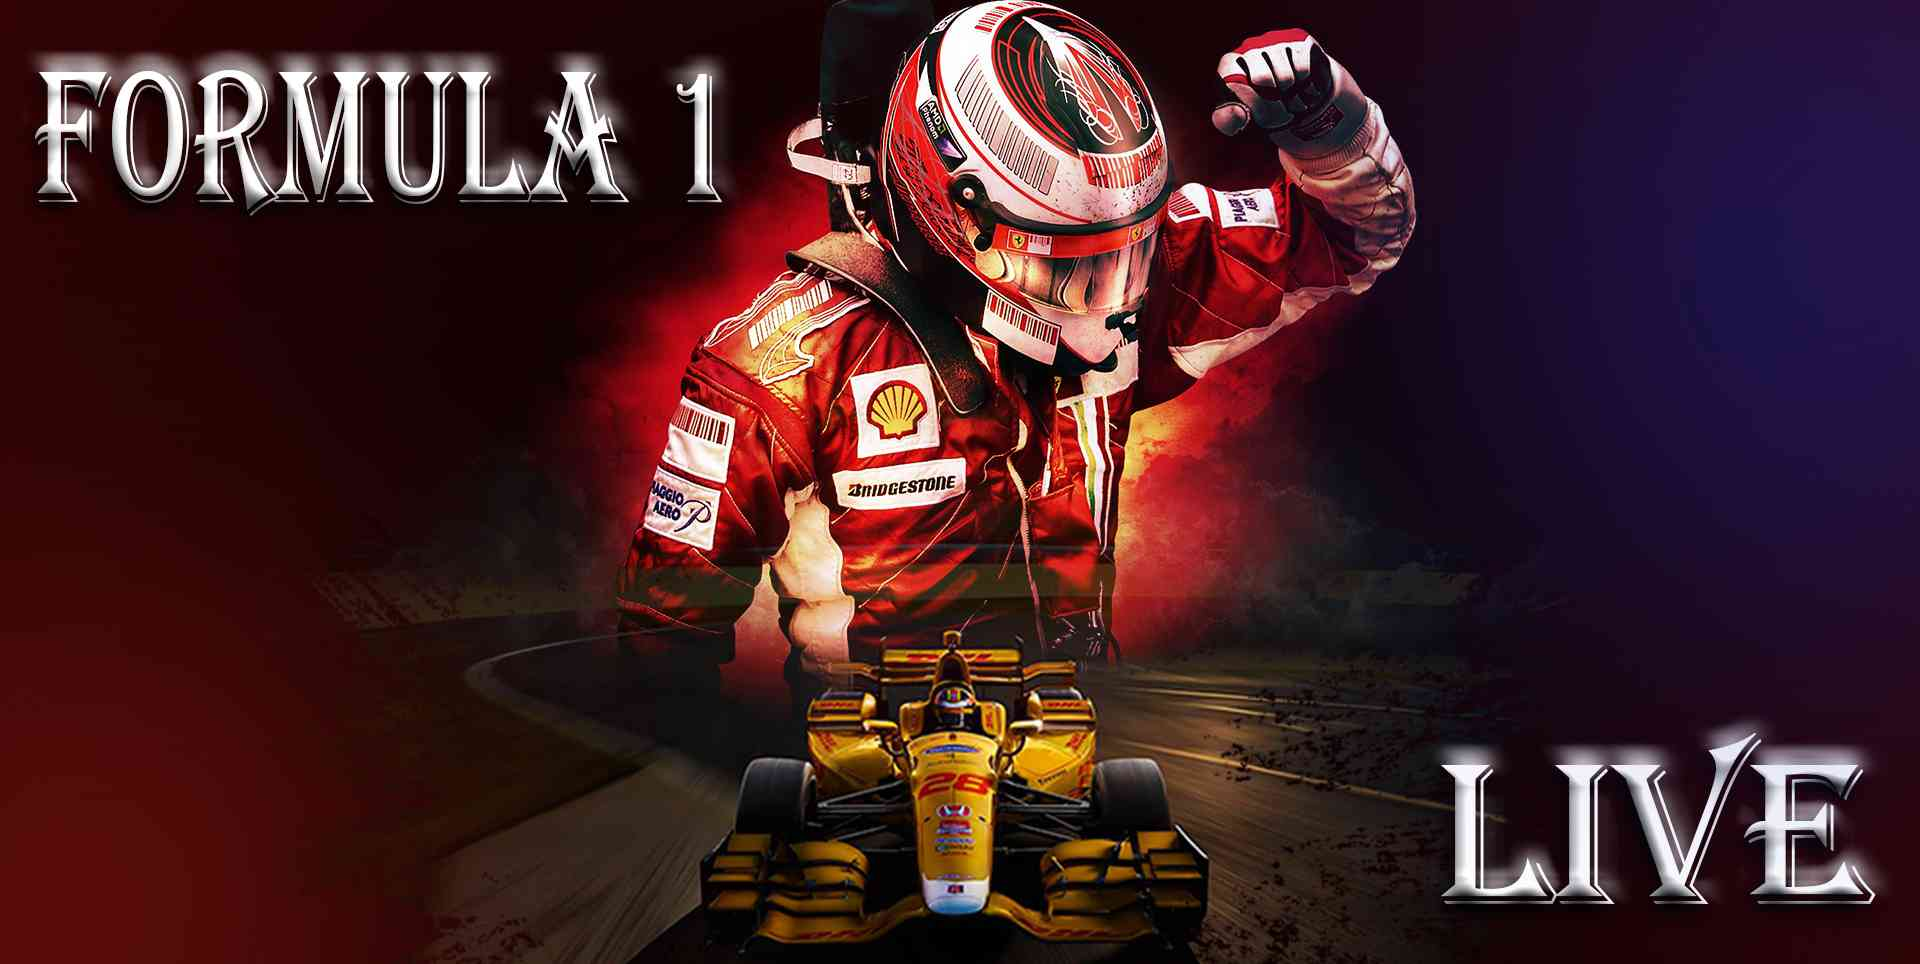 Spielberg Gp Rnd 4 2016 Race Live